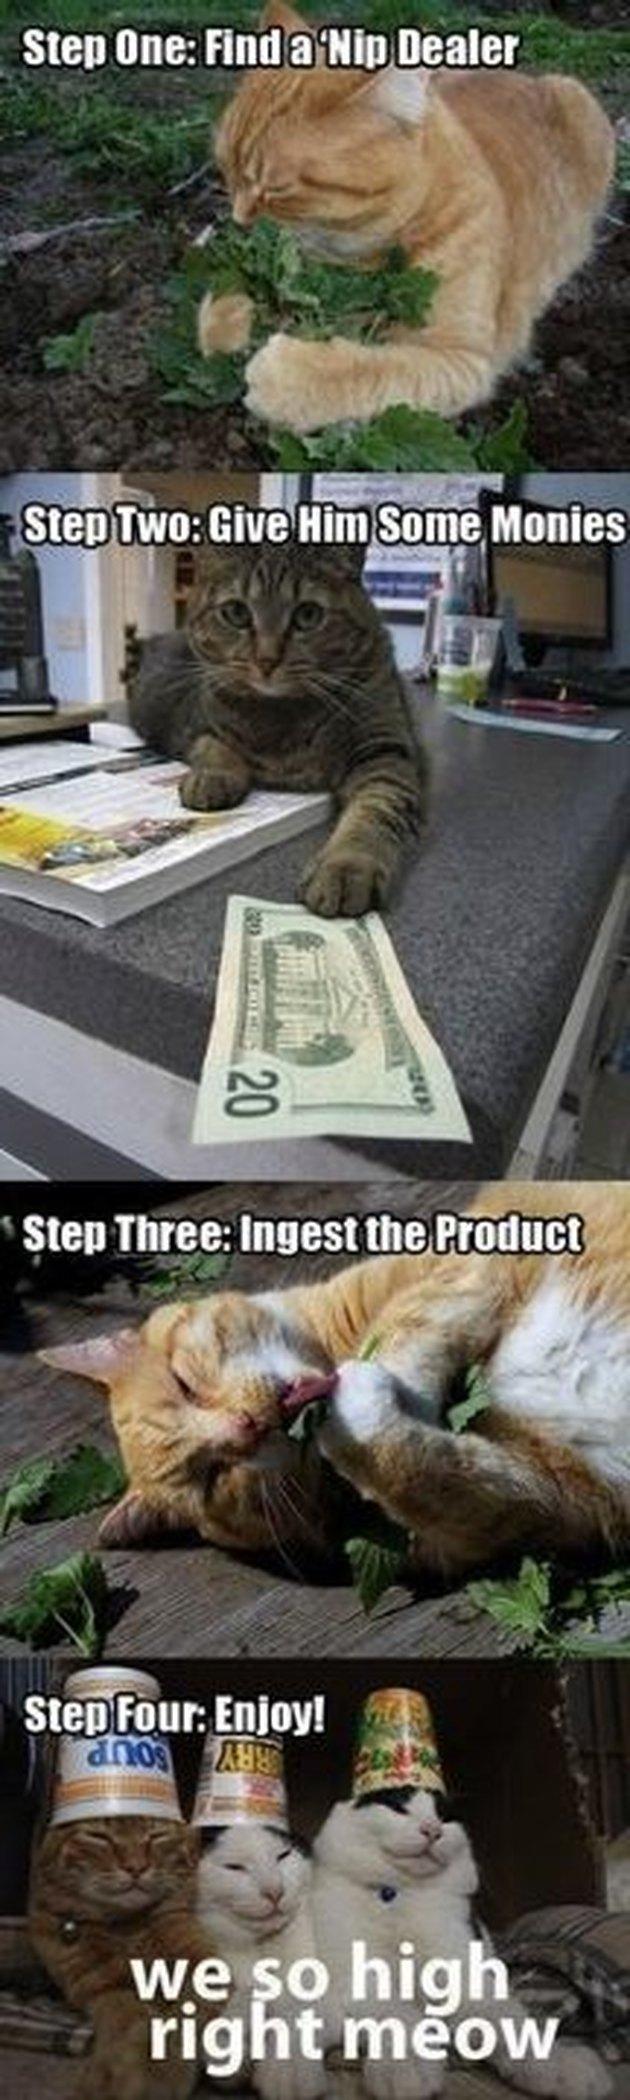 Catnip rings